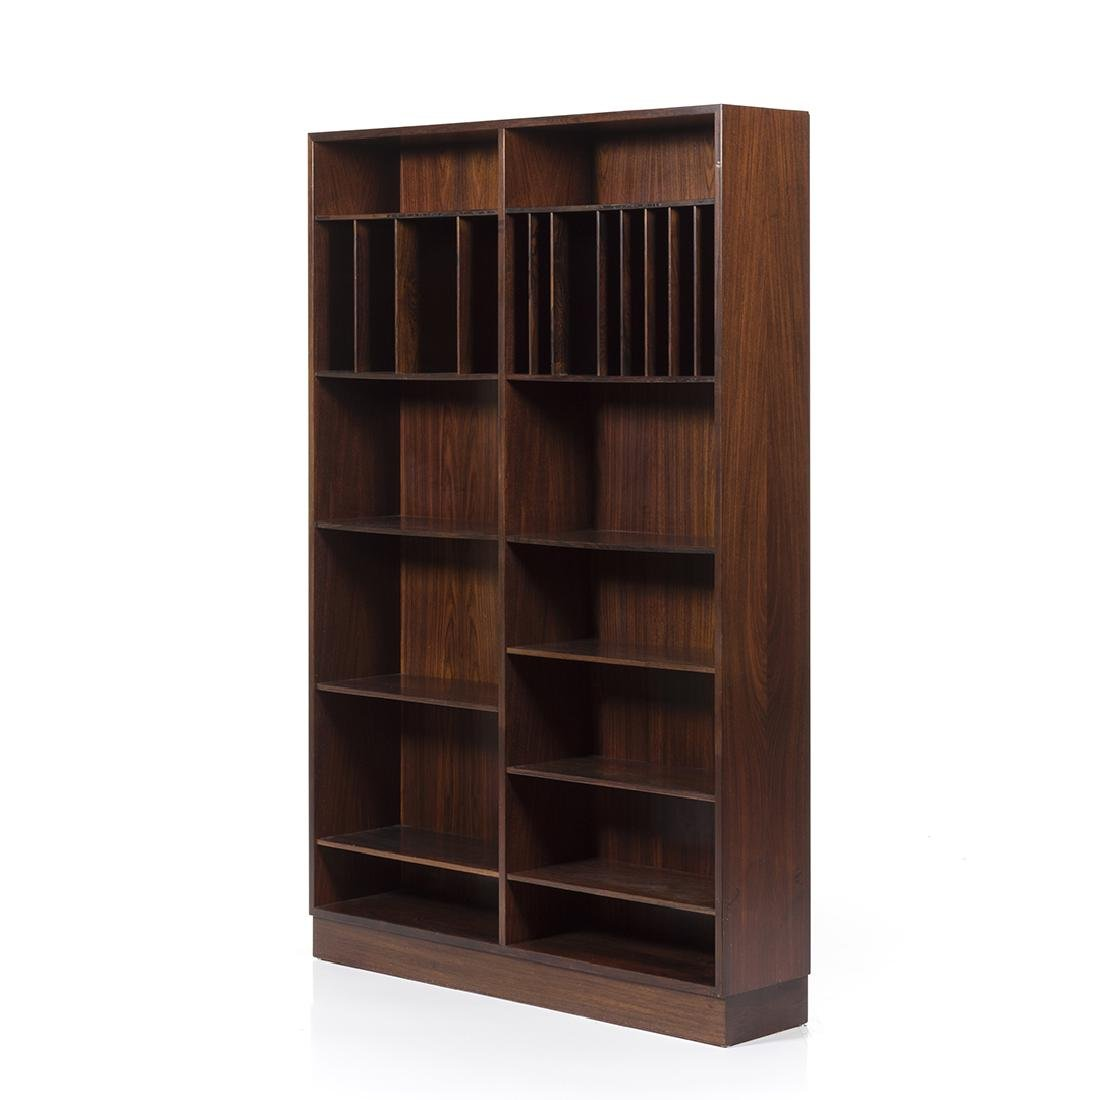 Danish Rosewood Bookcase - 2